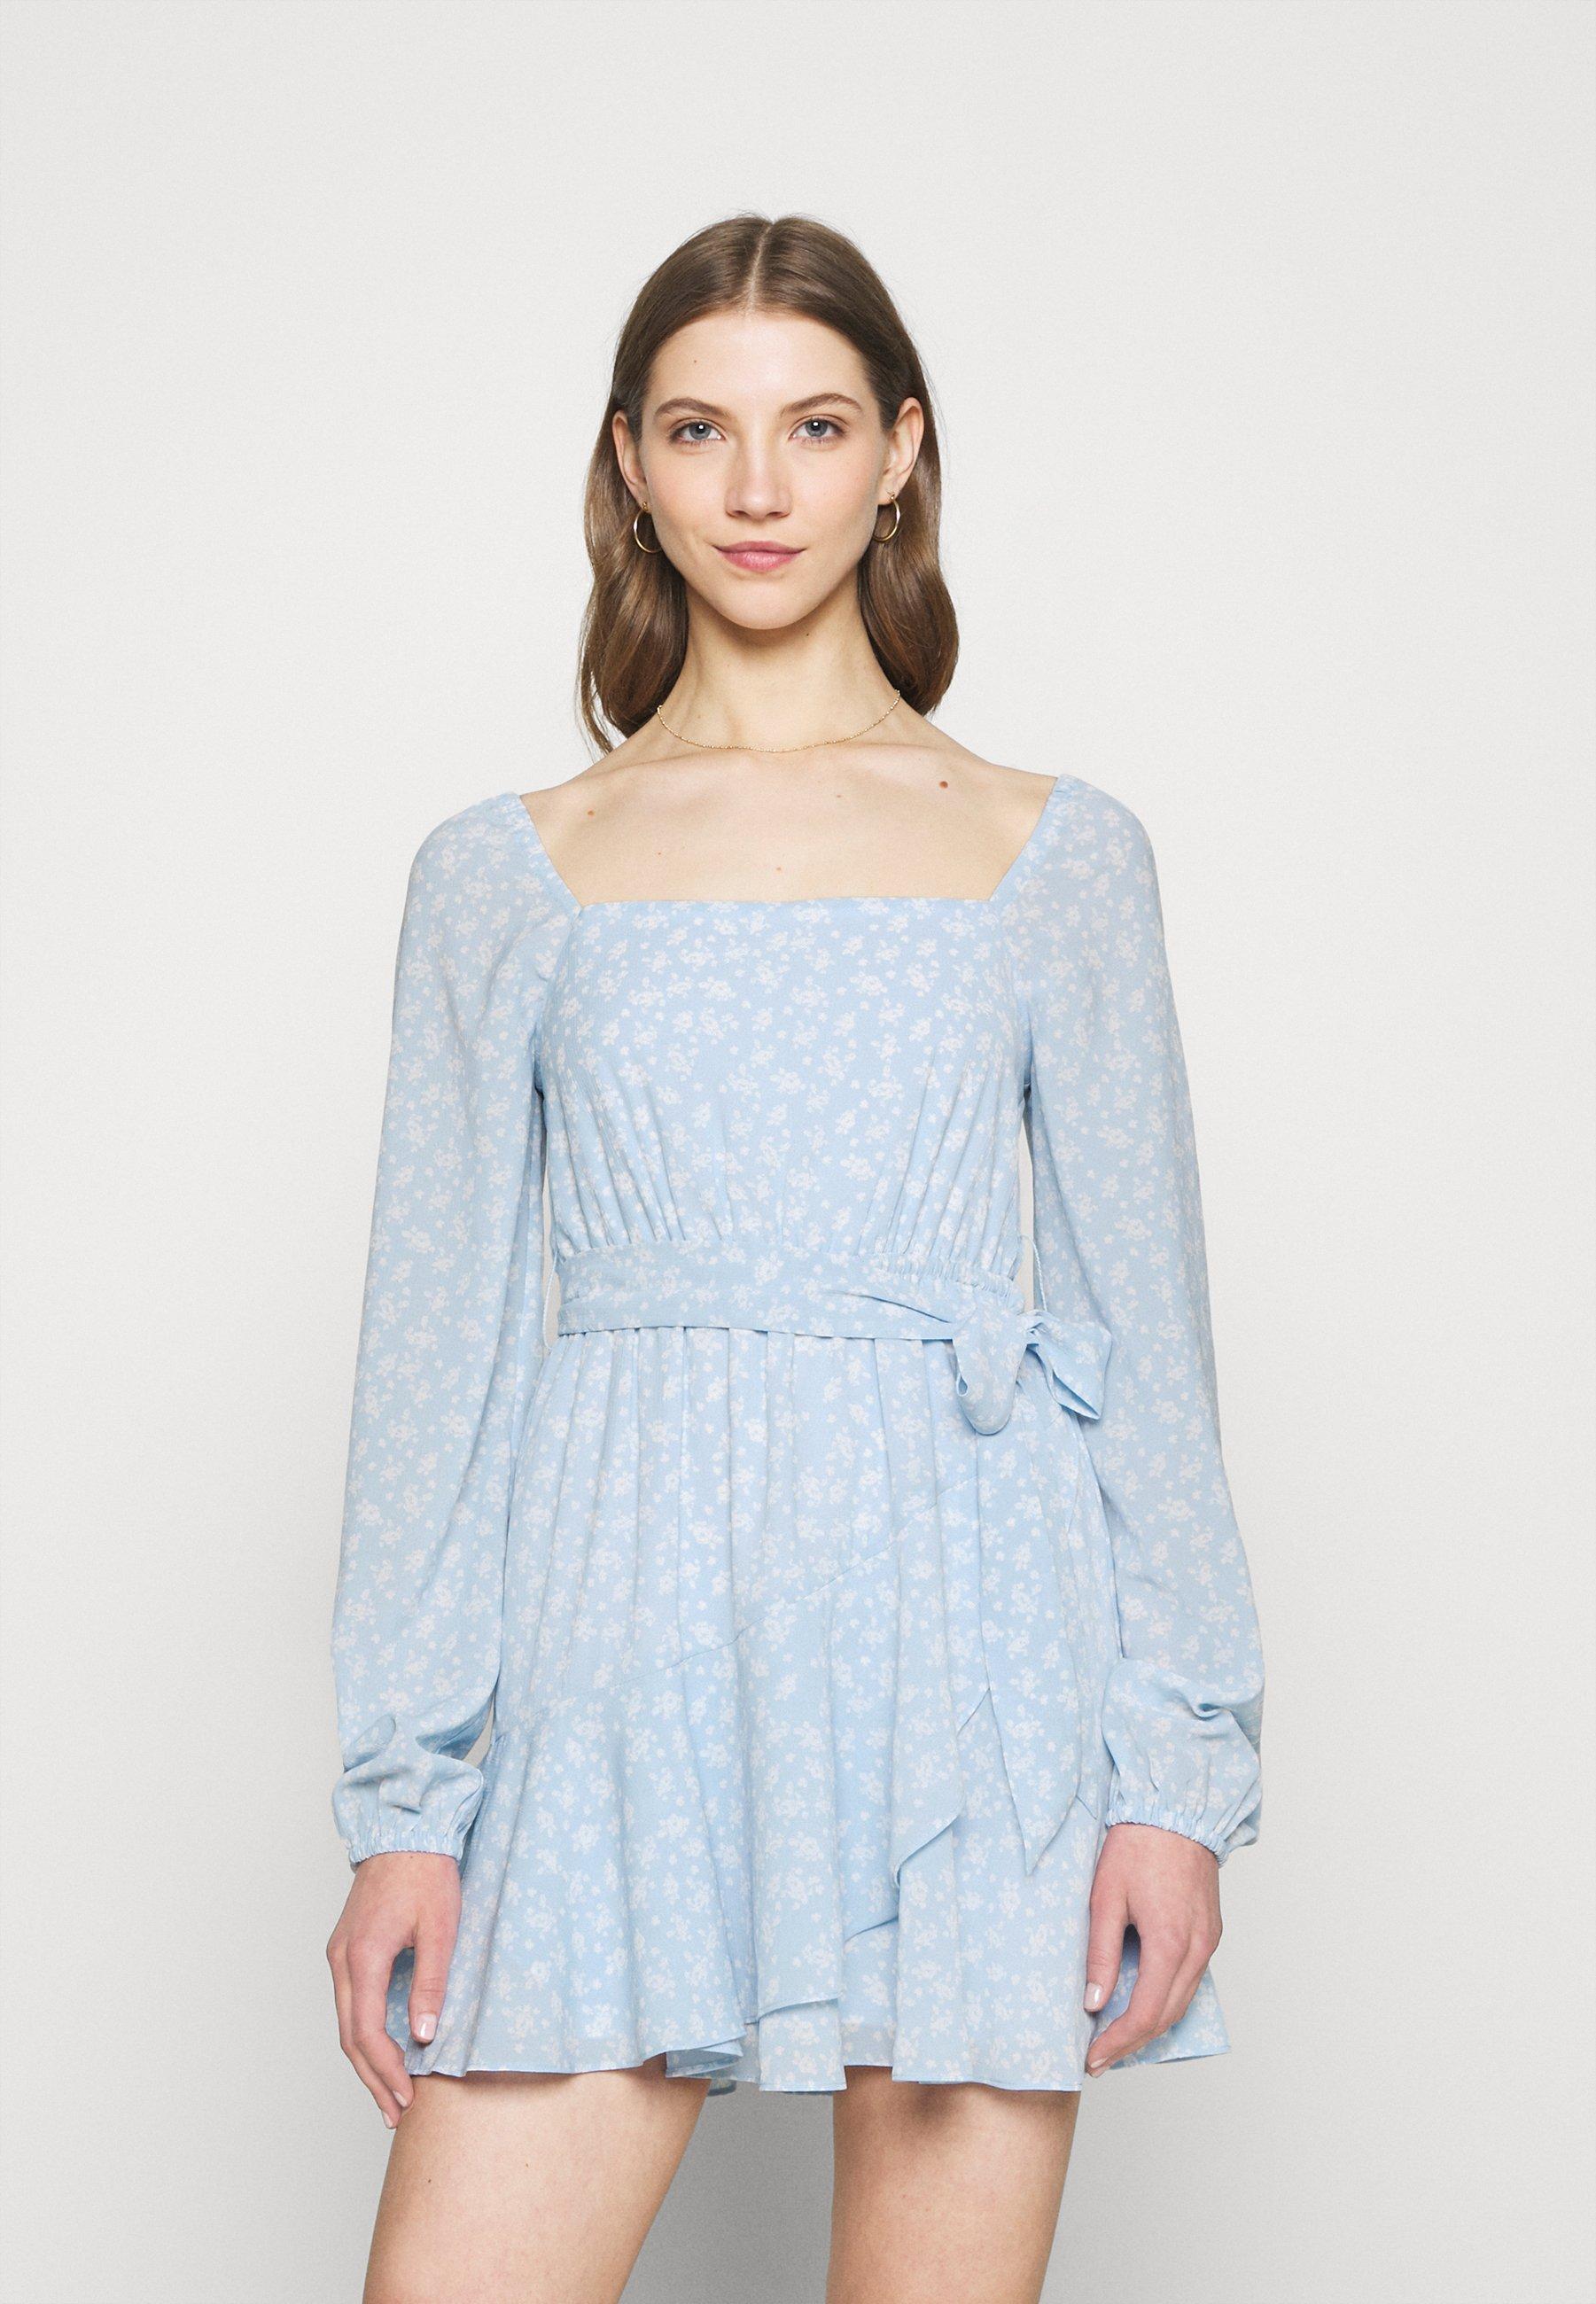 Women PAMELA REIF X ZALANDO OVERLAPPED FRILL MINI DRESS - Day dress